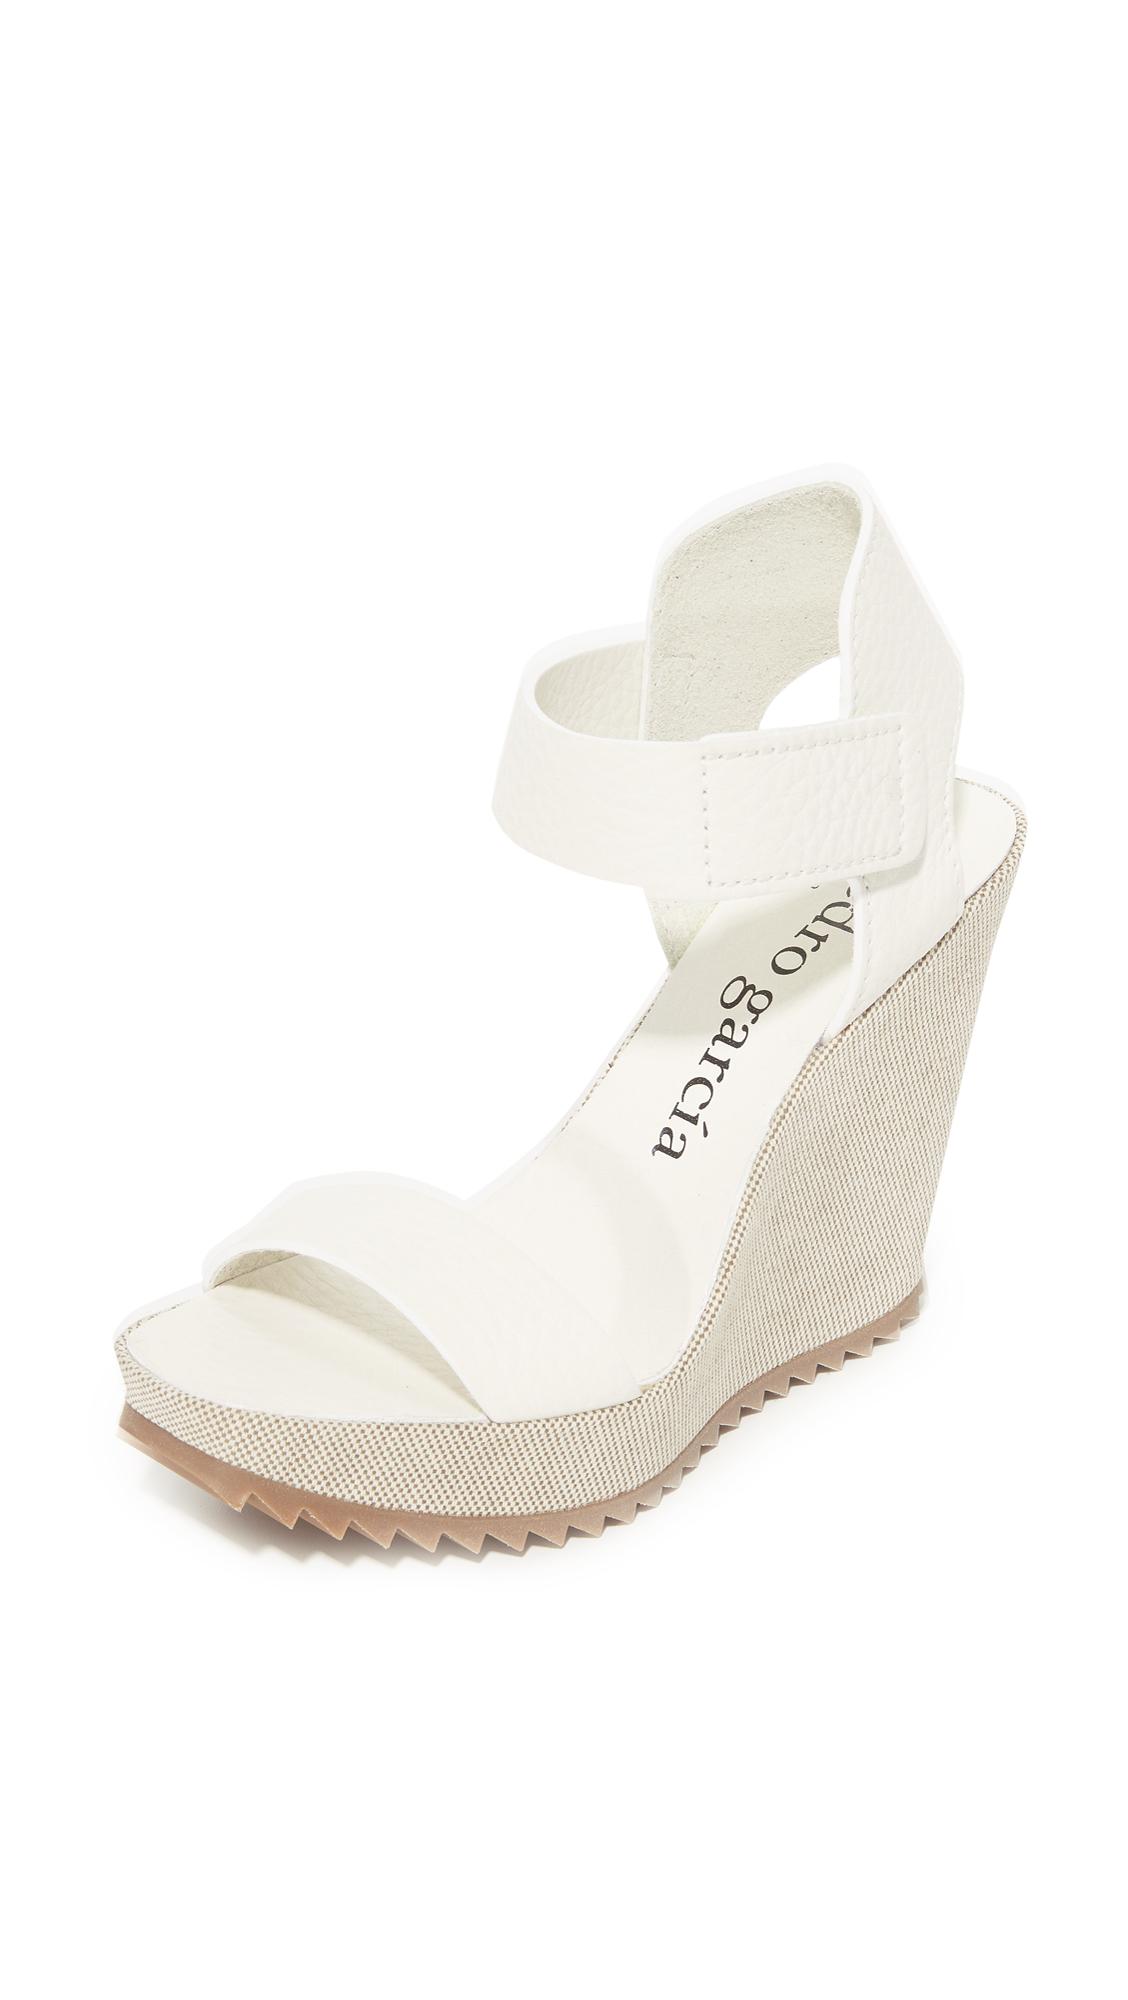 Pedro Garcia Vivien Wedge Sandals - White